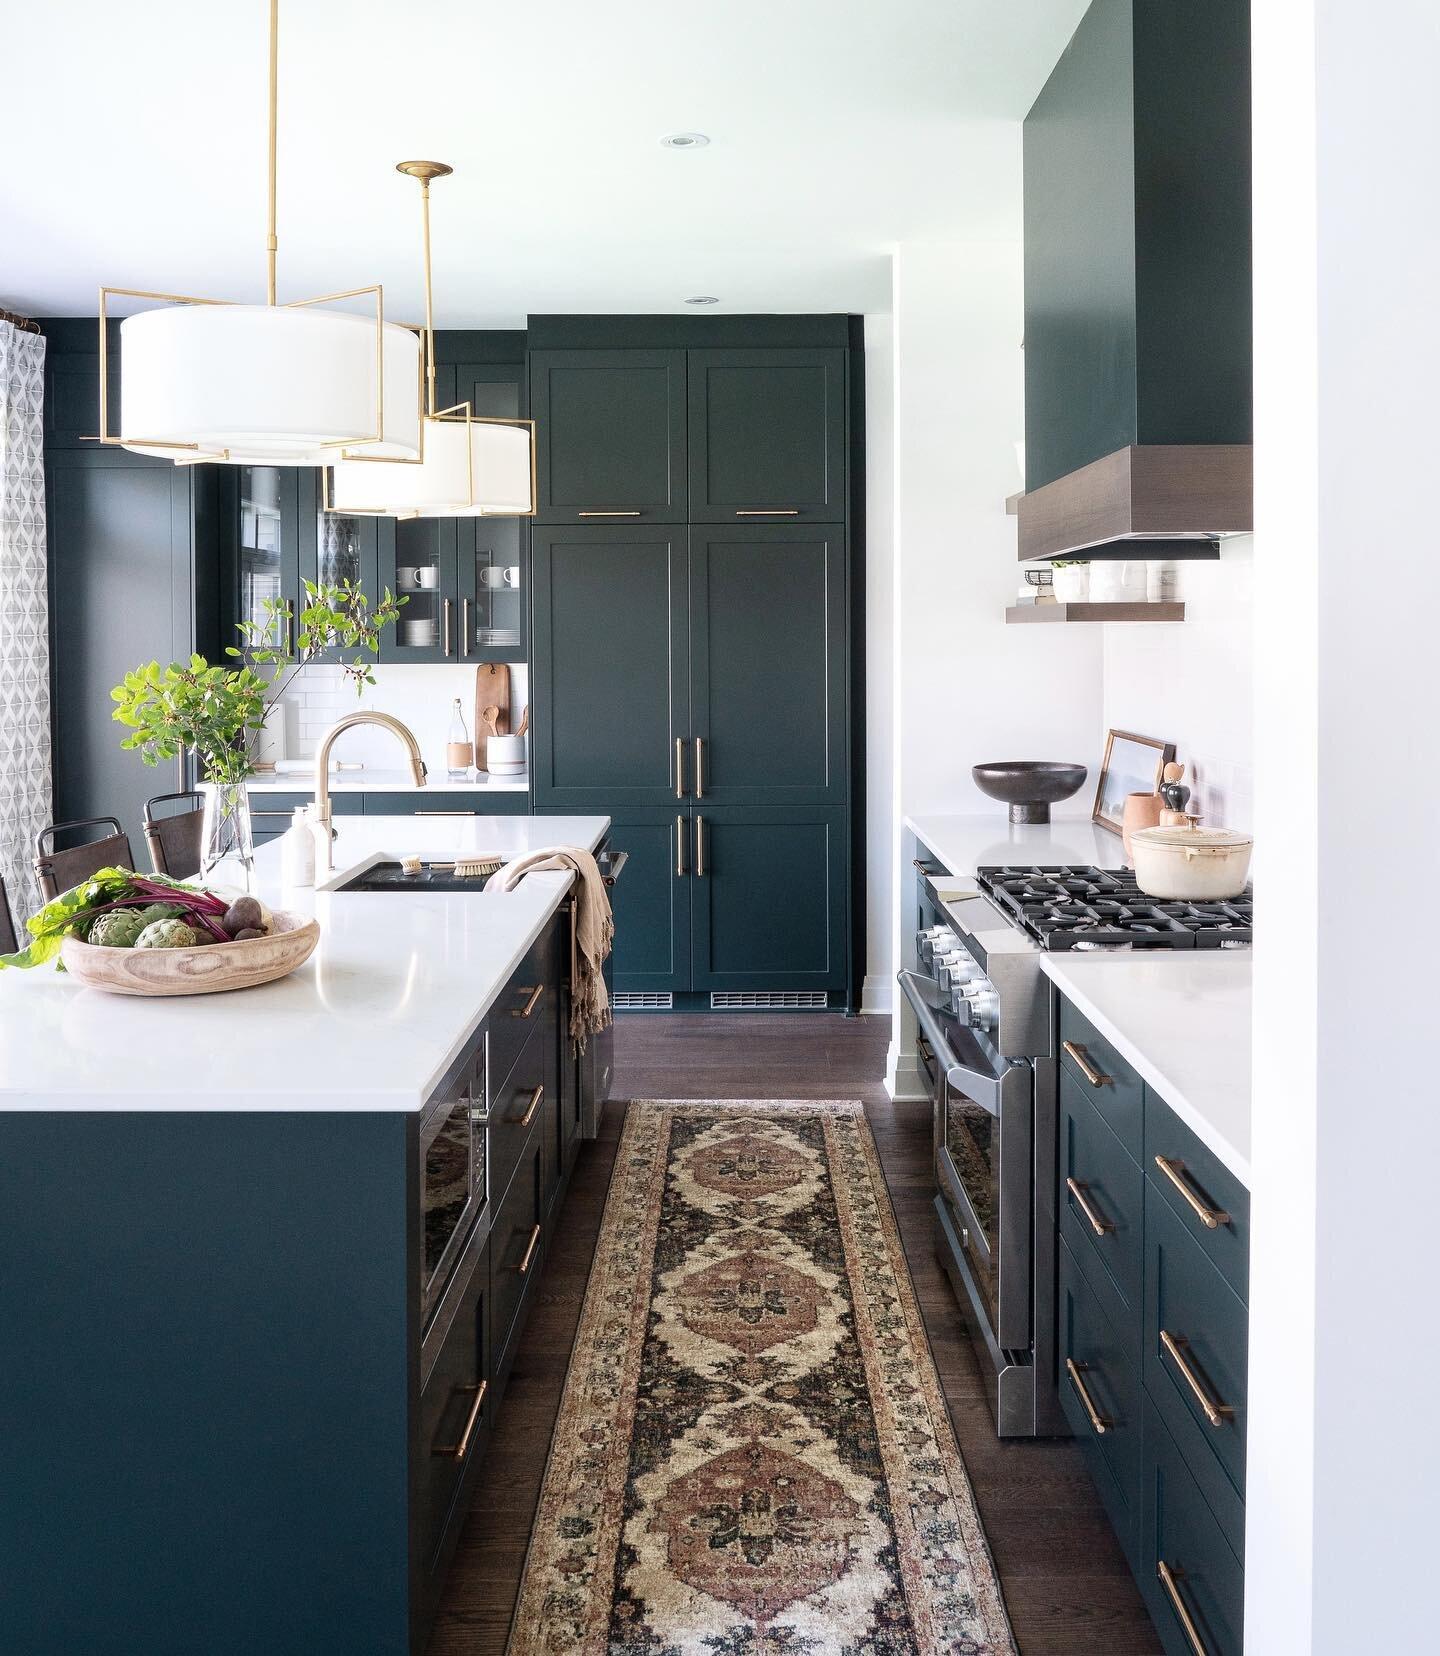 Shop the kitchen |   Saguaro Bowl  ,   Evie Ivory/Spice Runner  ,     Liam Pendant